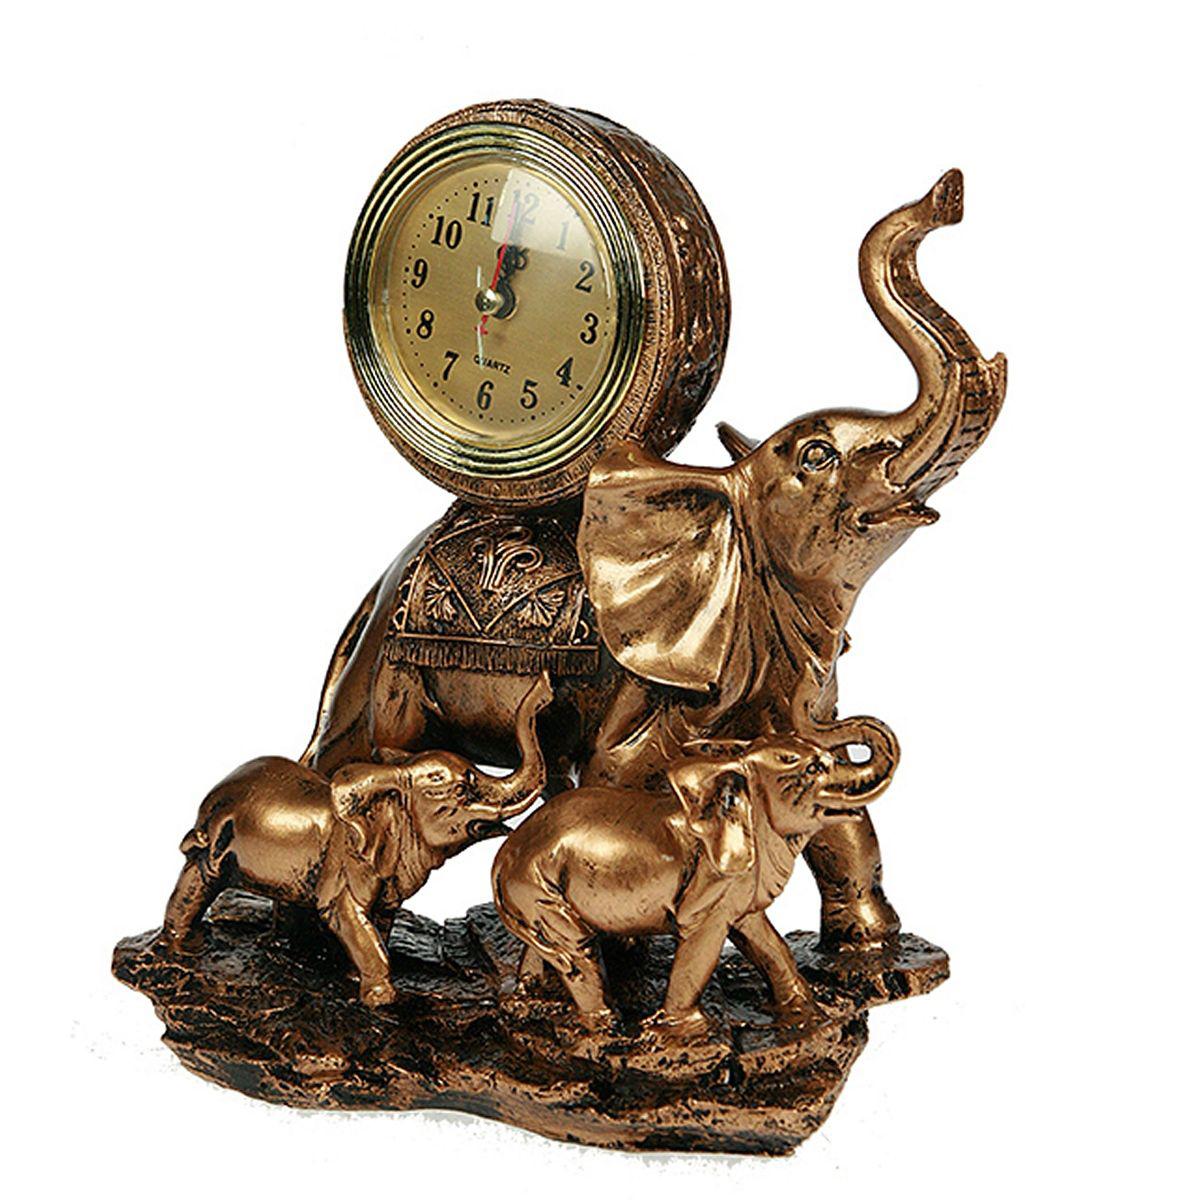 Часы настольные Русские Подарки Слоны, 20 х 12 х 25 см. 5936759367